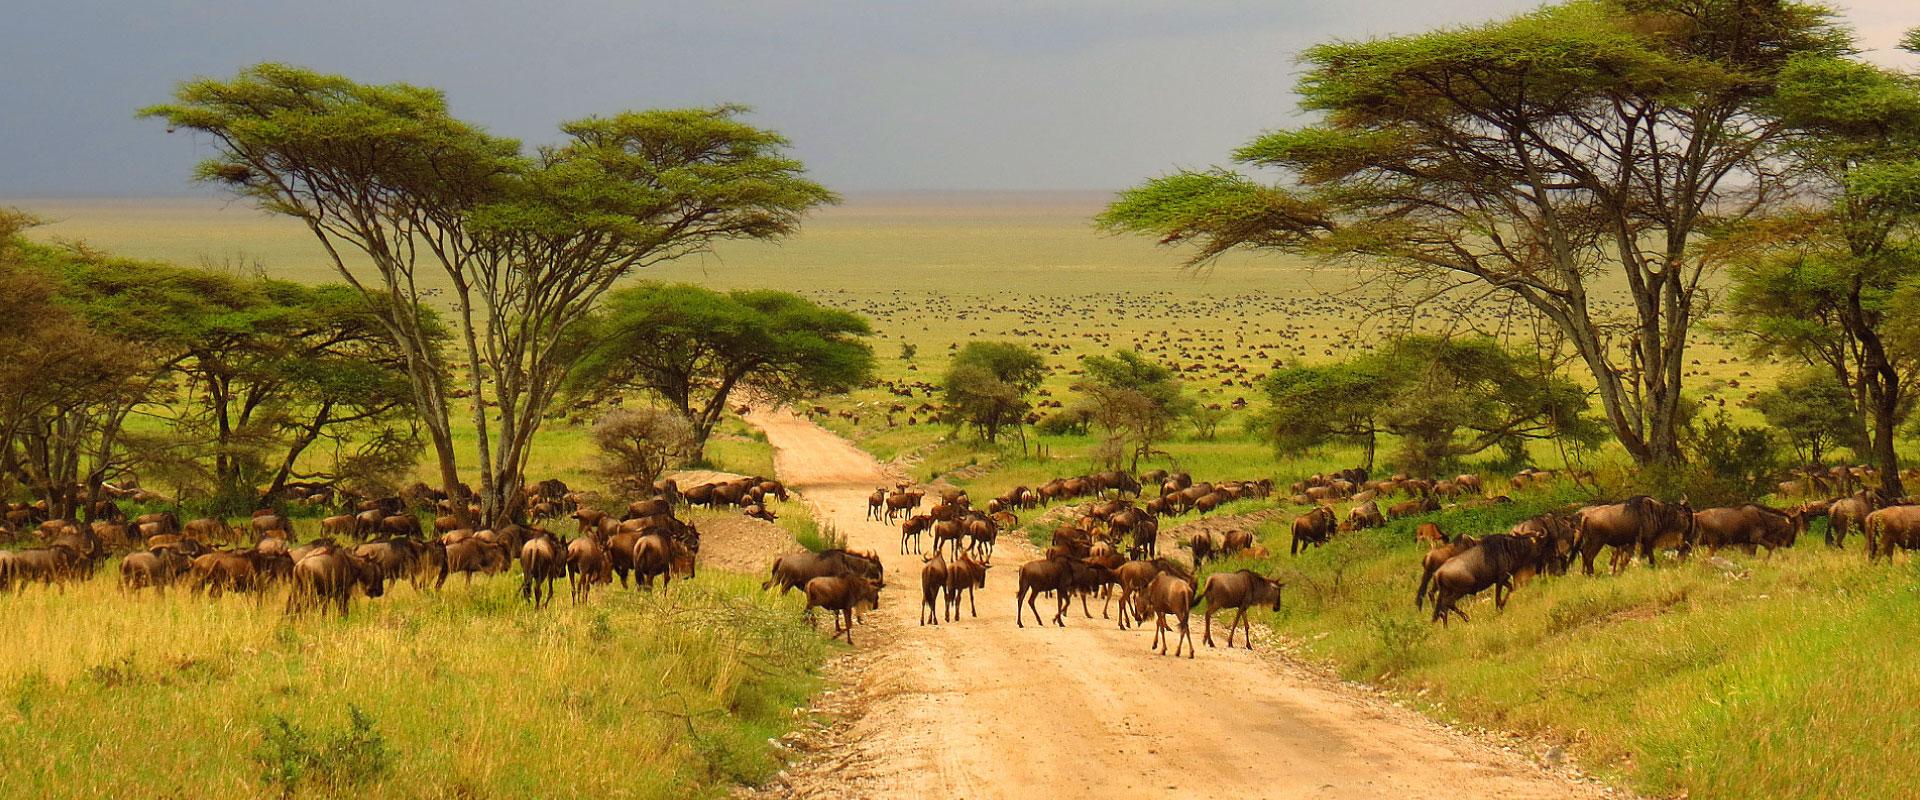 wildebeest in tanzania safari tour